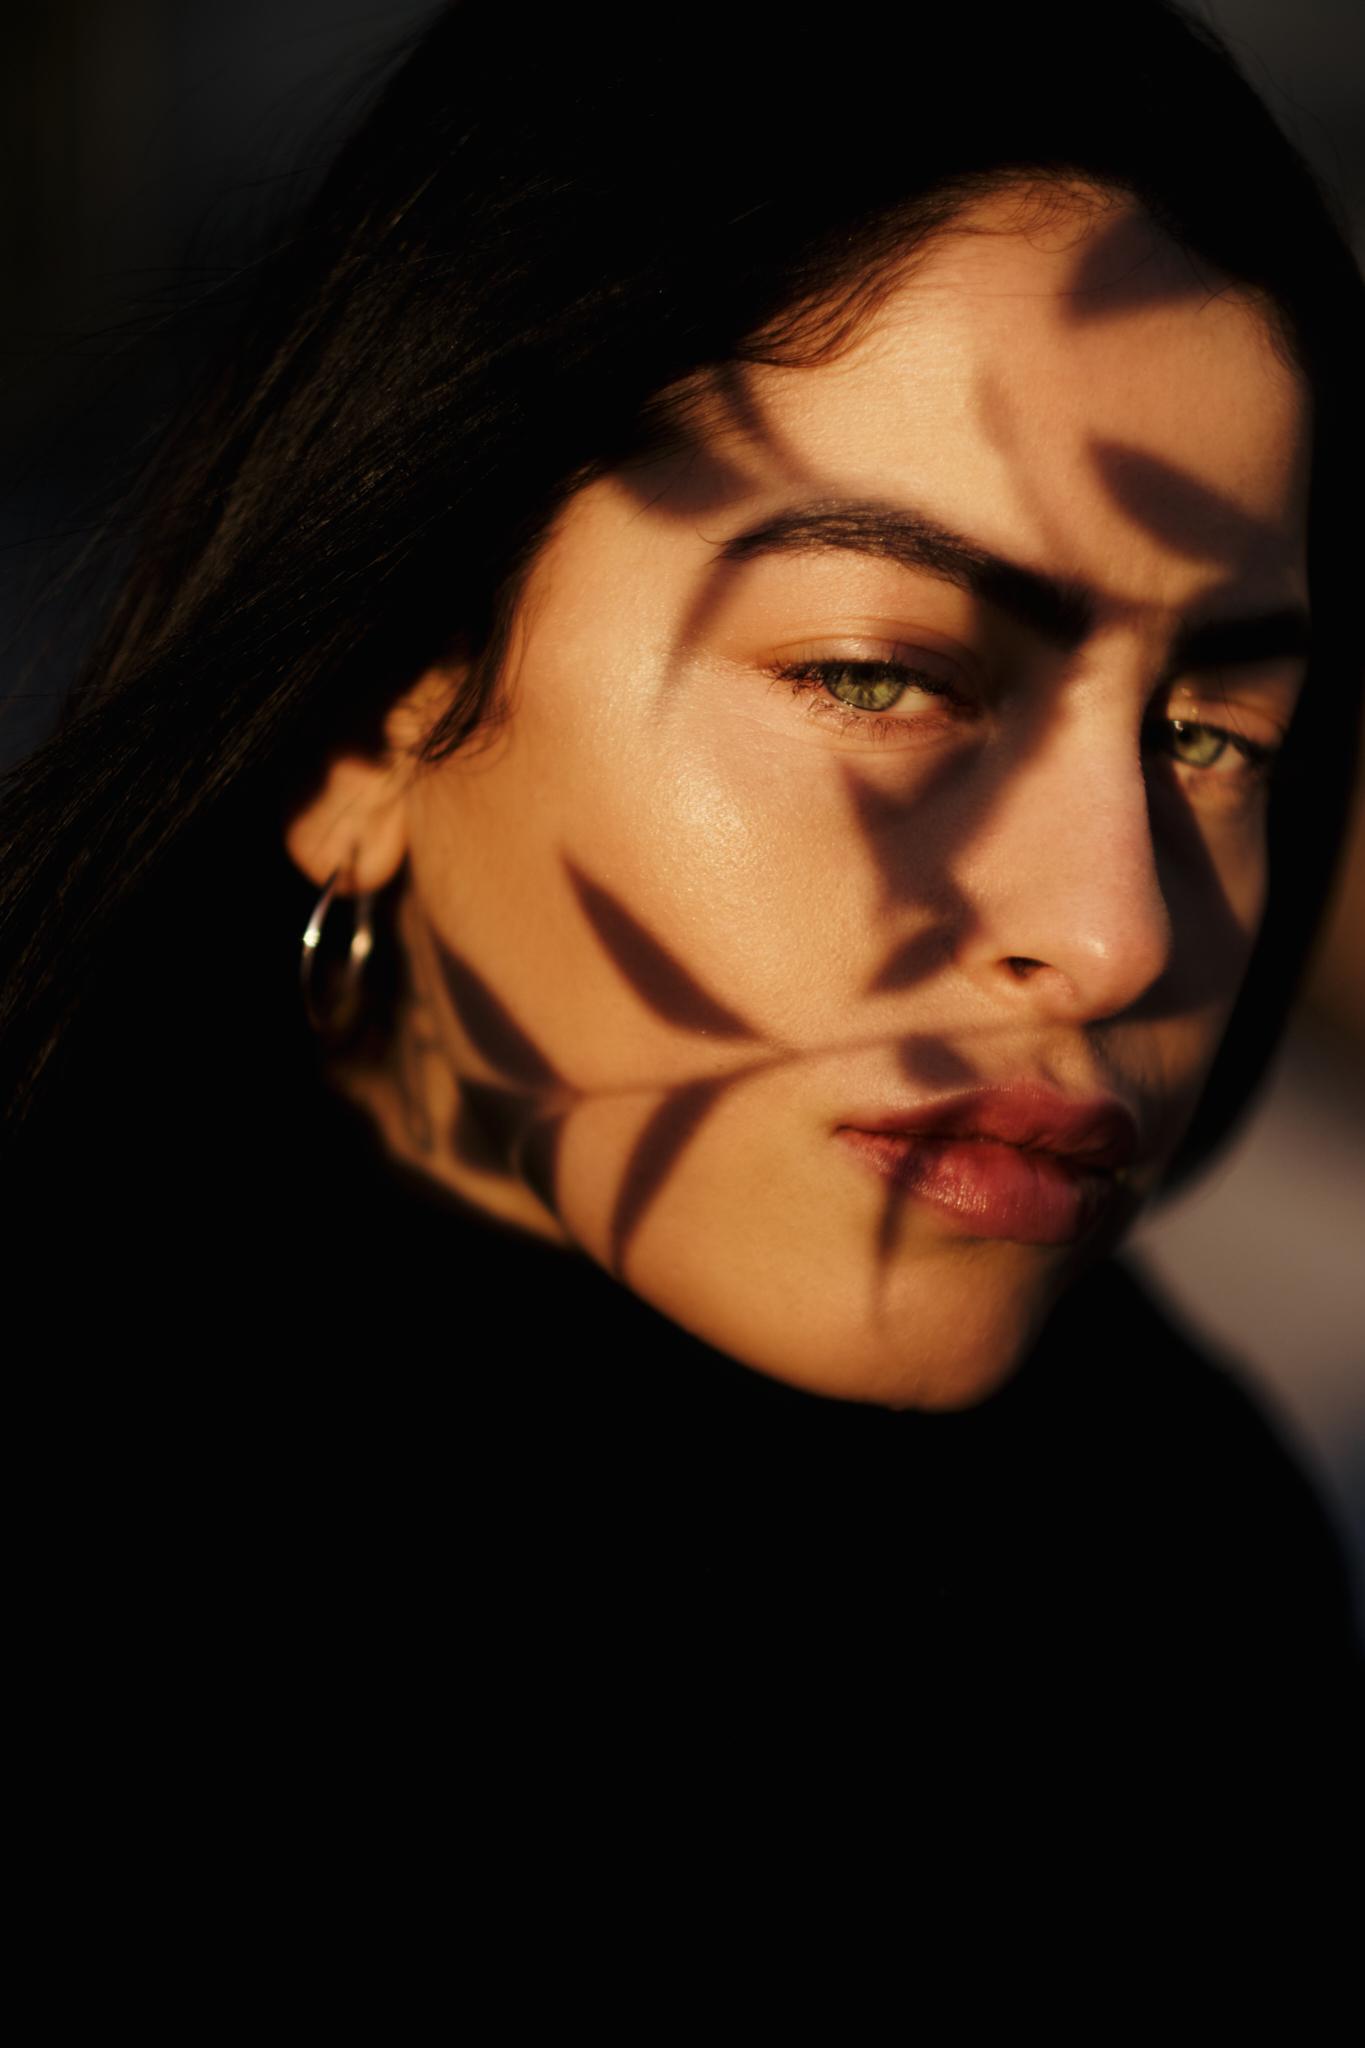 Outdoor color portrait photograph of a woman by Fabio Salmoirago